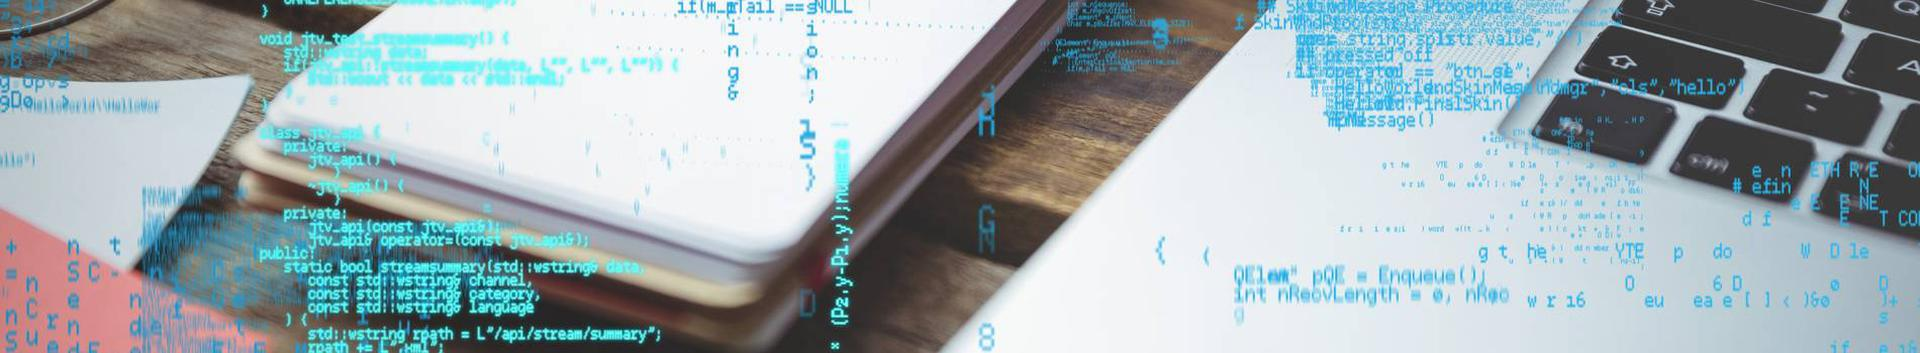 62011_programmeerimine_74856360_xl.jpg